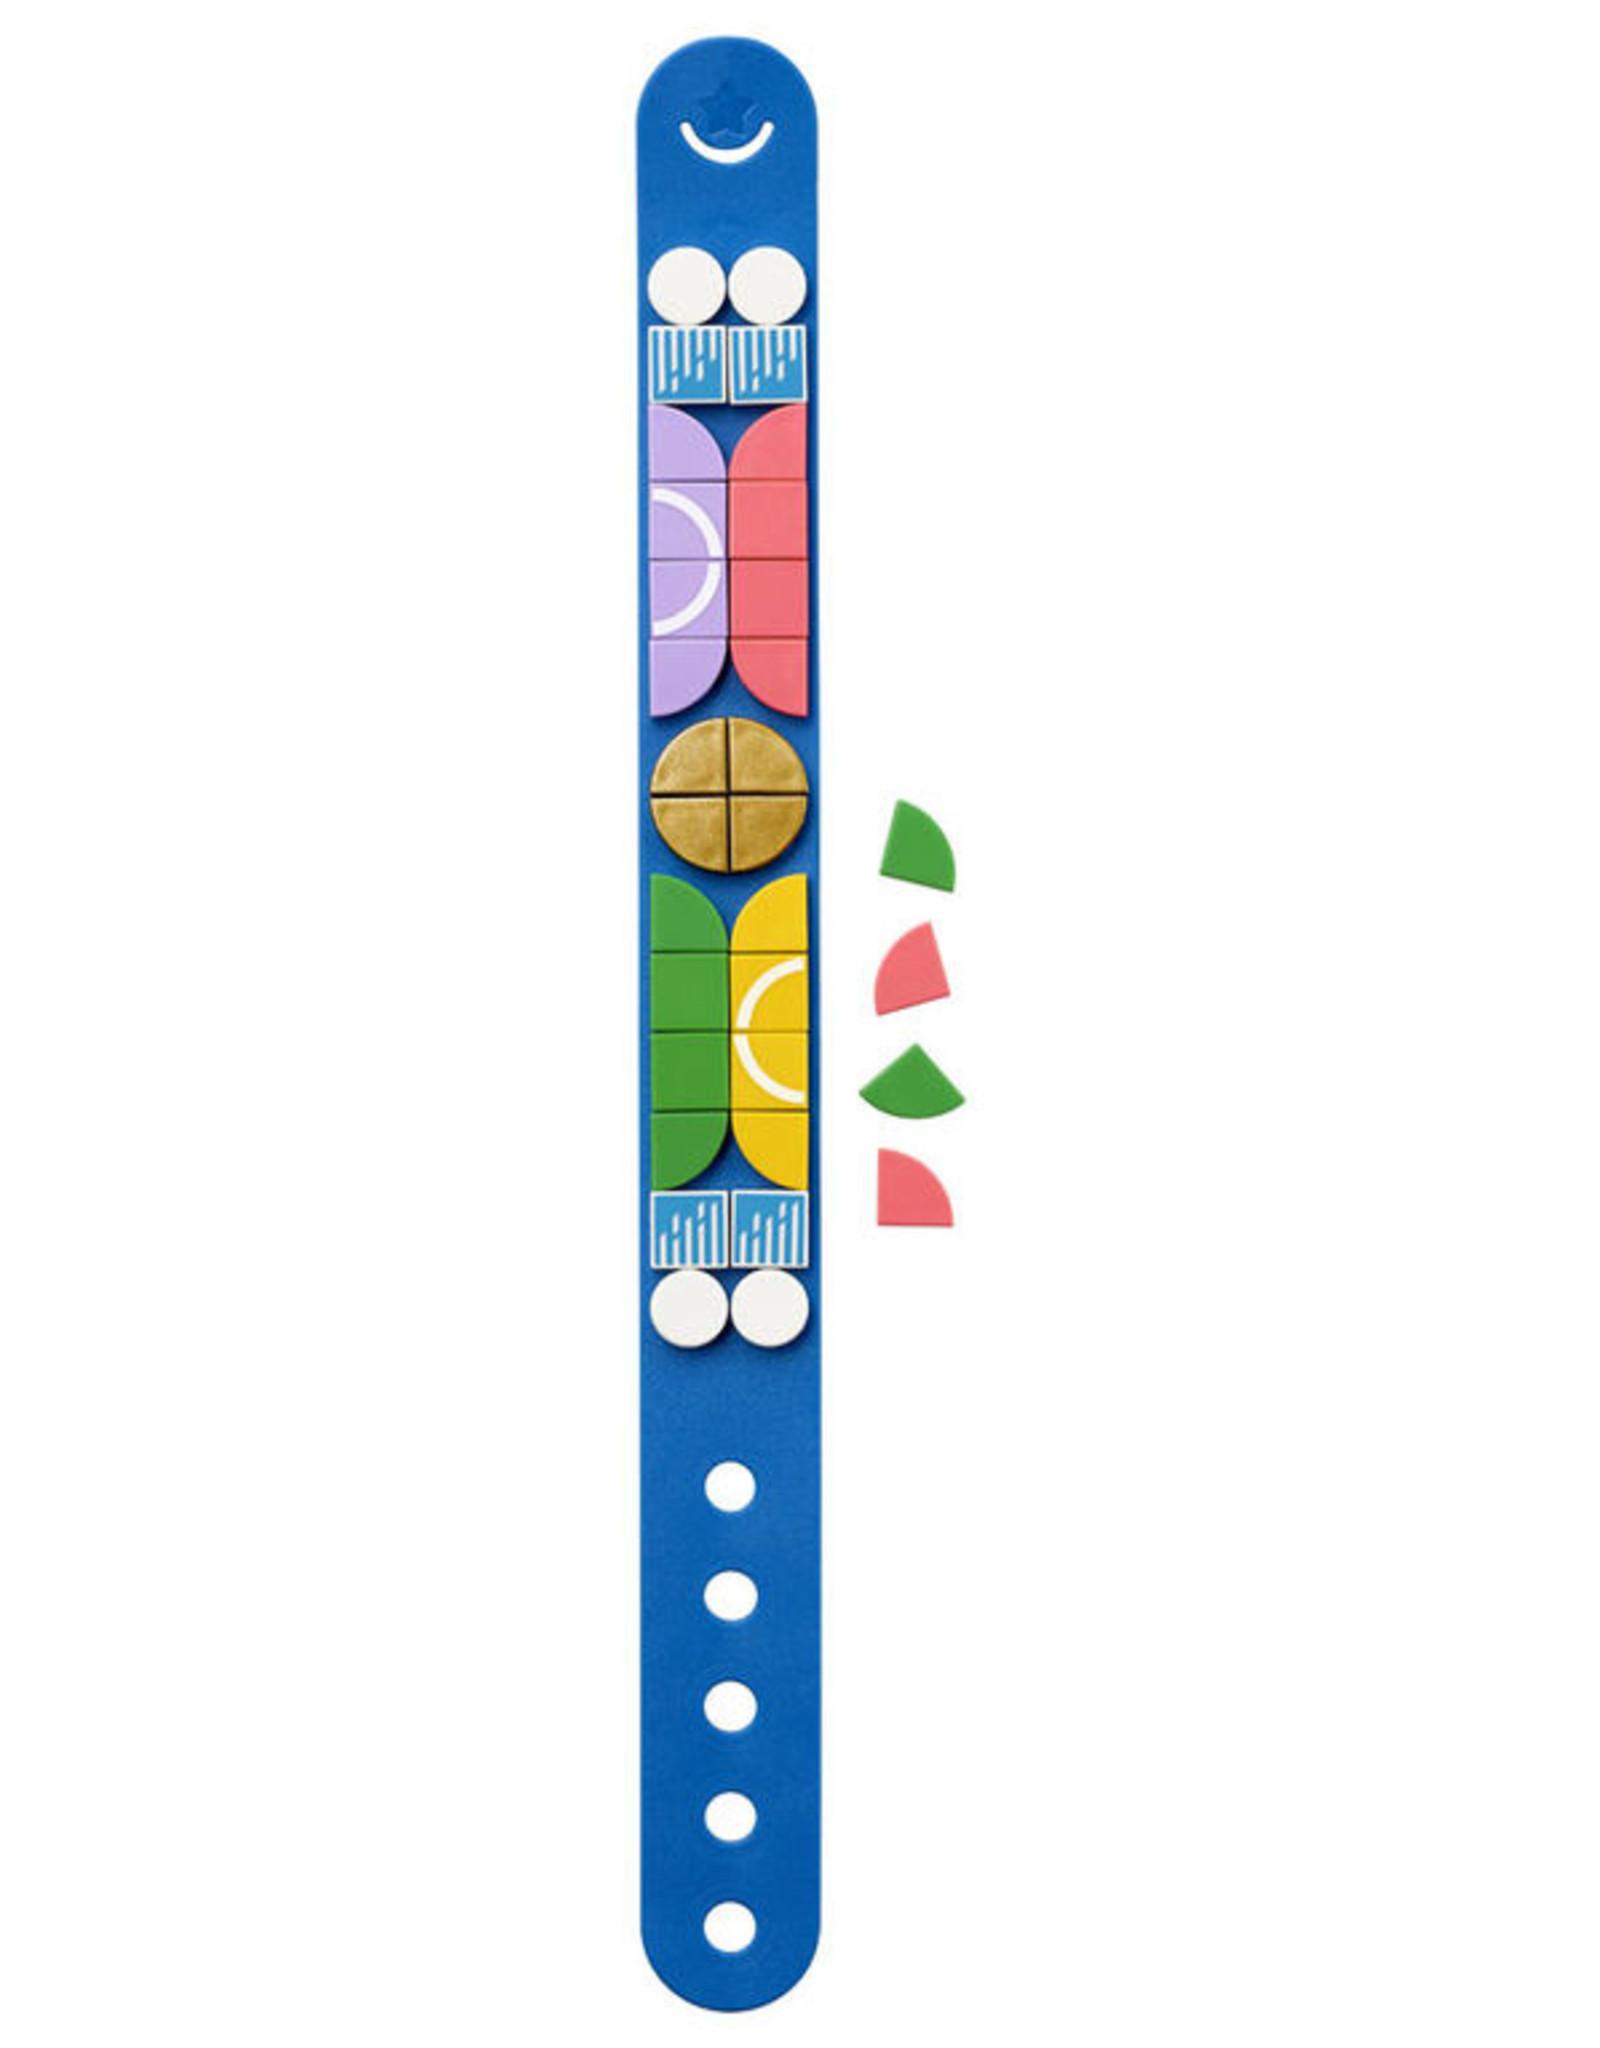 LEGO DOTS - 41911 - GO TEAM! BRACELET